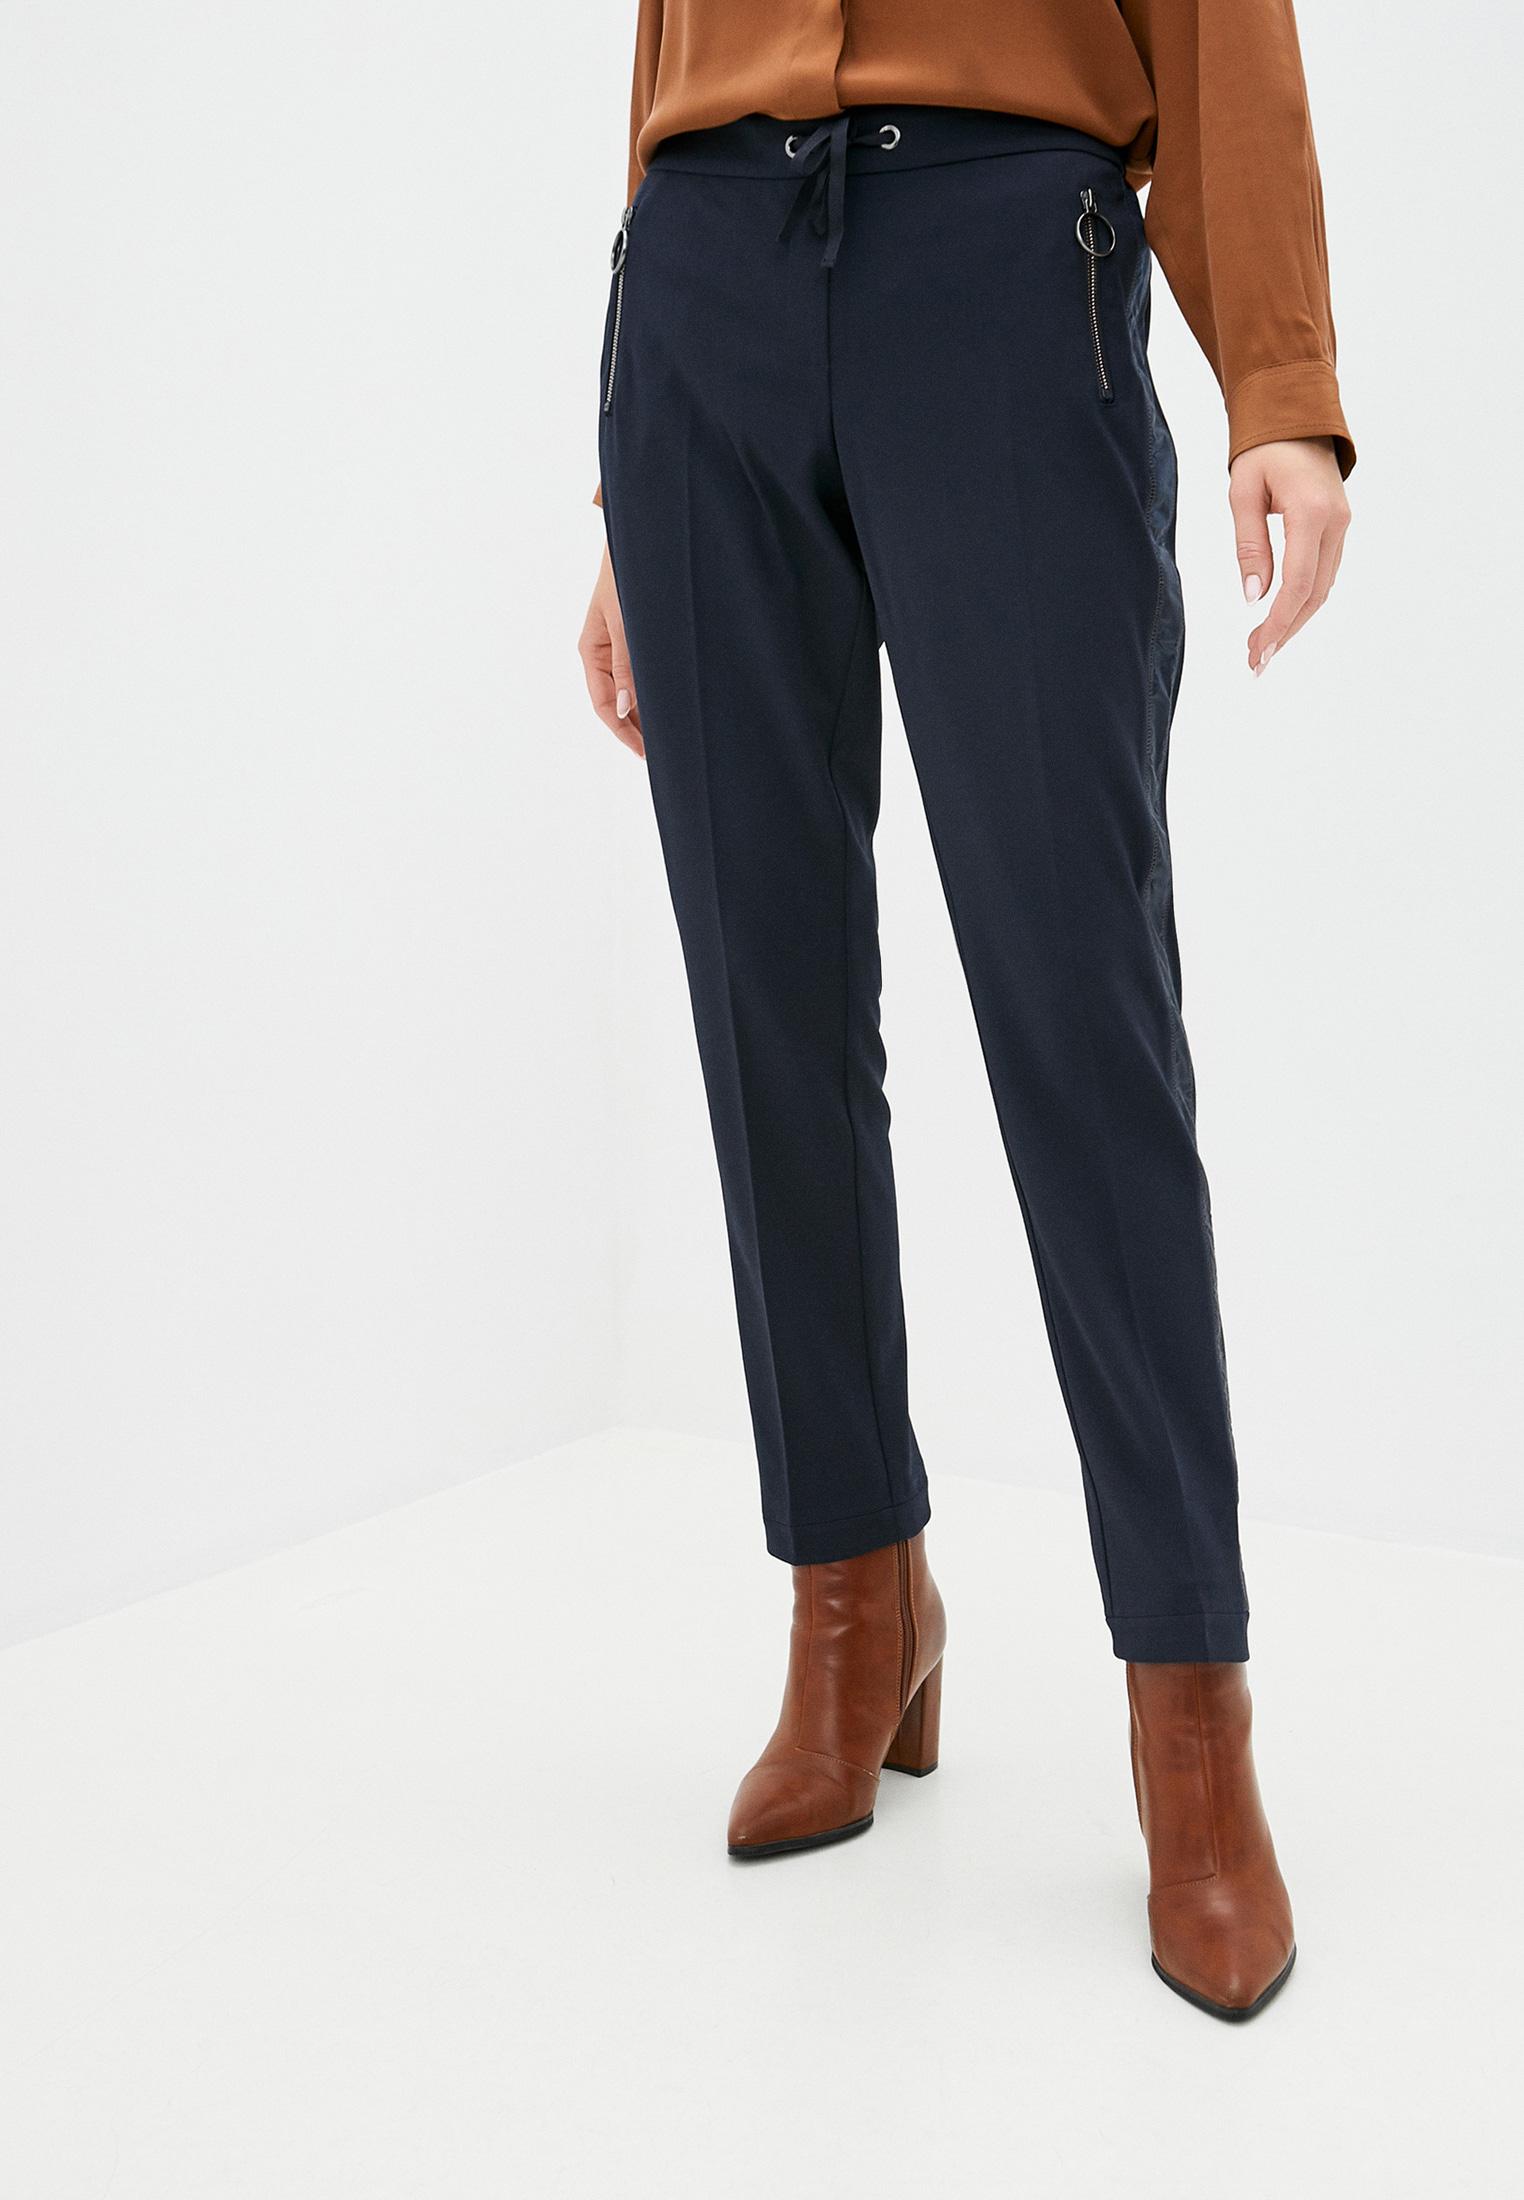 Женские прямые брюки Betty Barclay 6187/1707